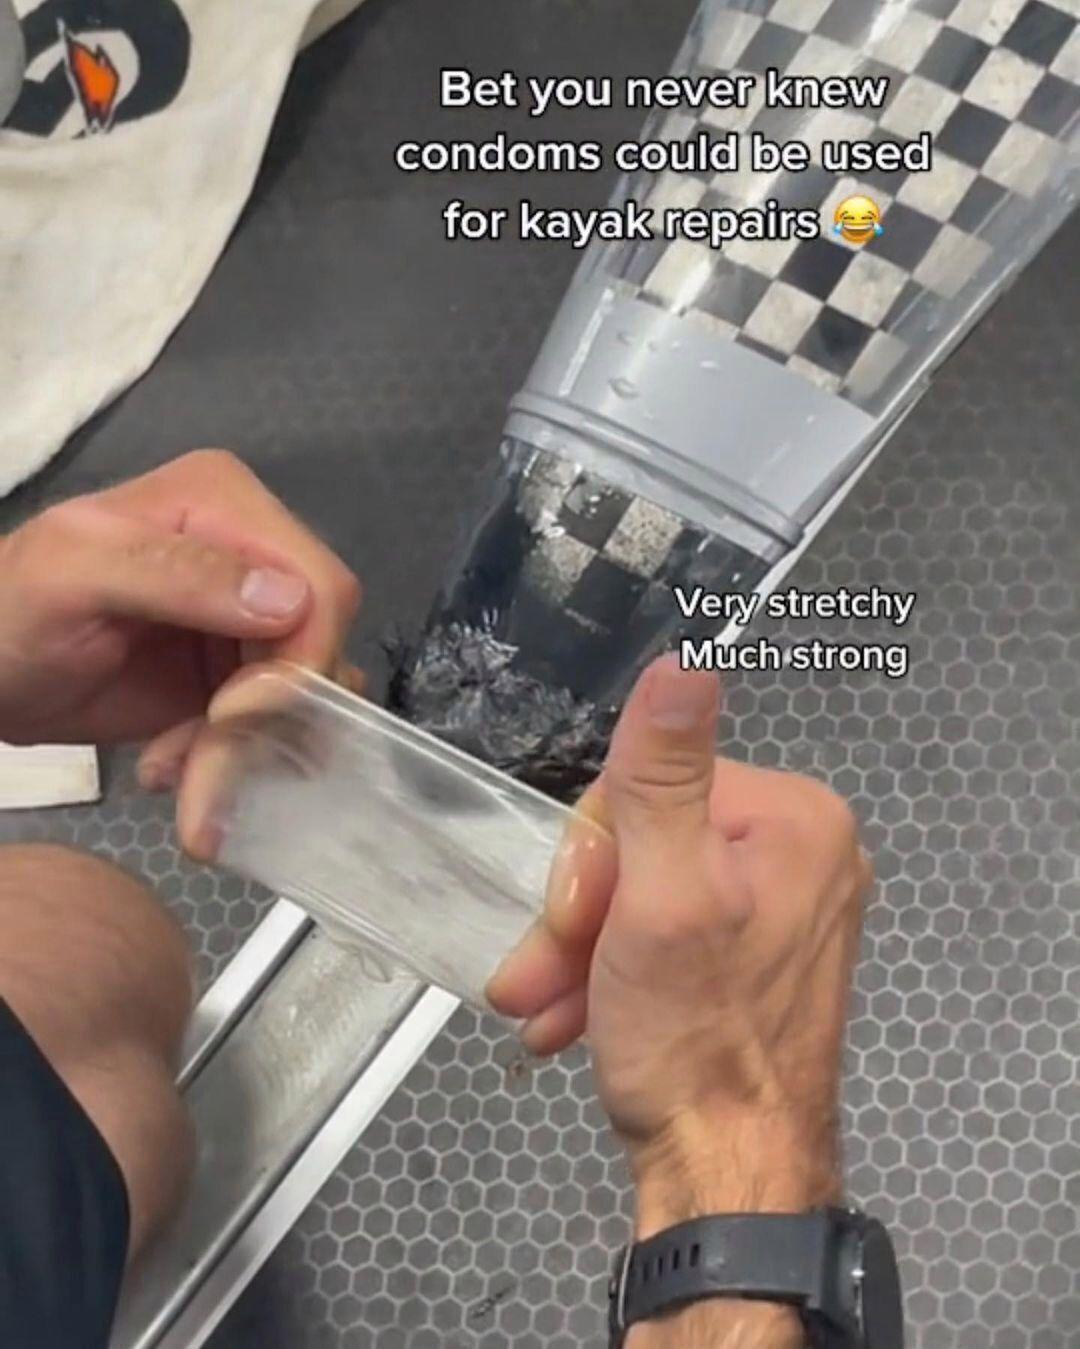 Презерватив использовали для ремонта каяка